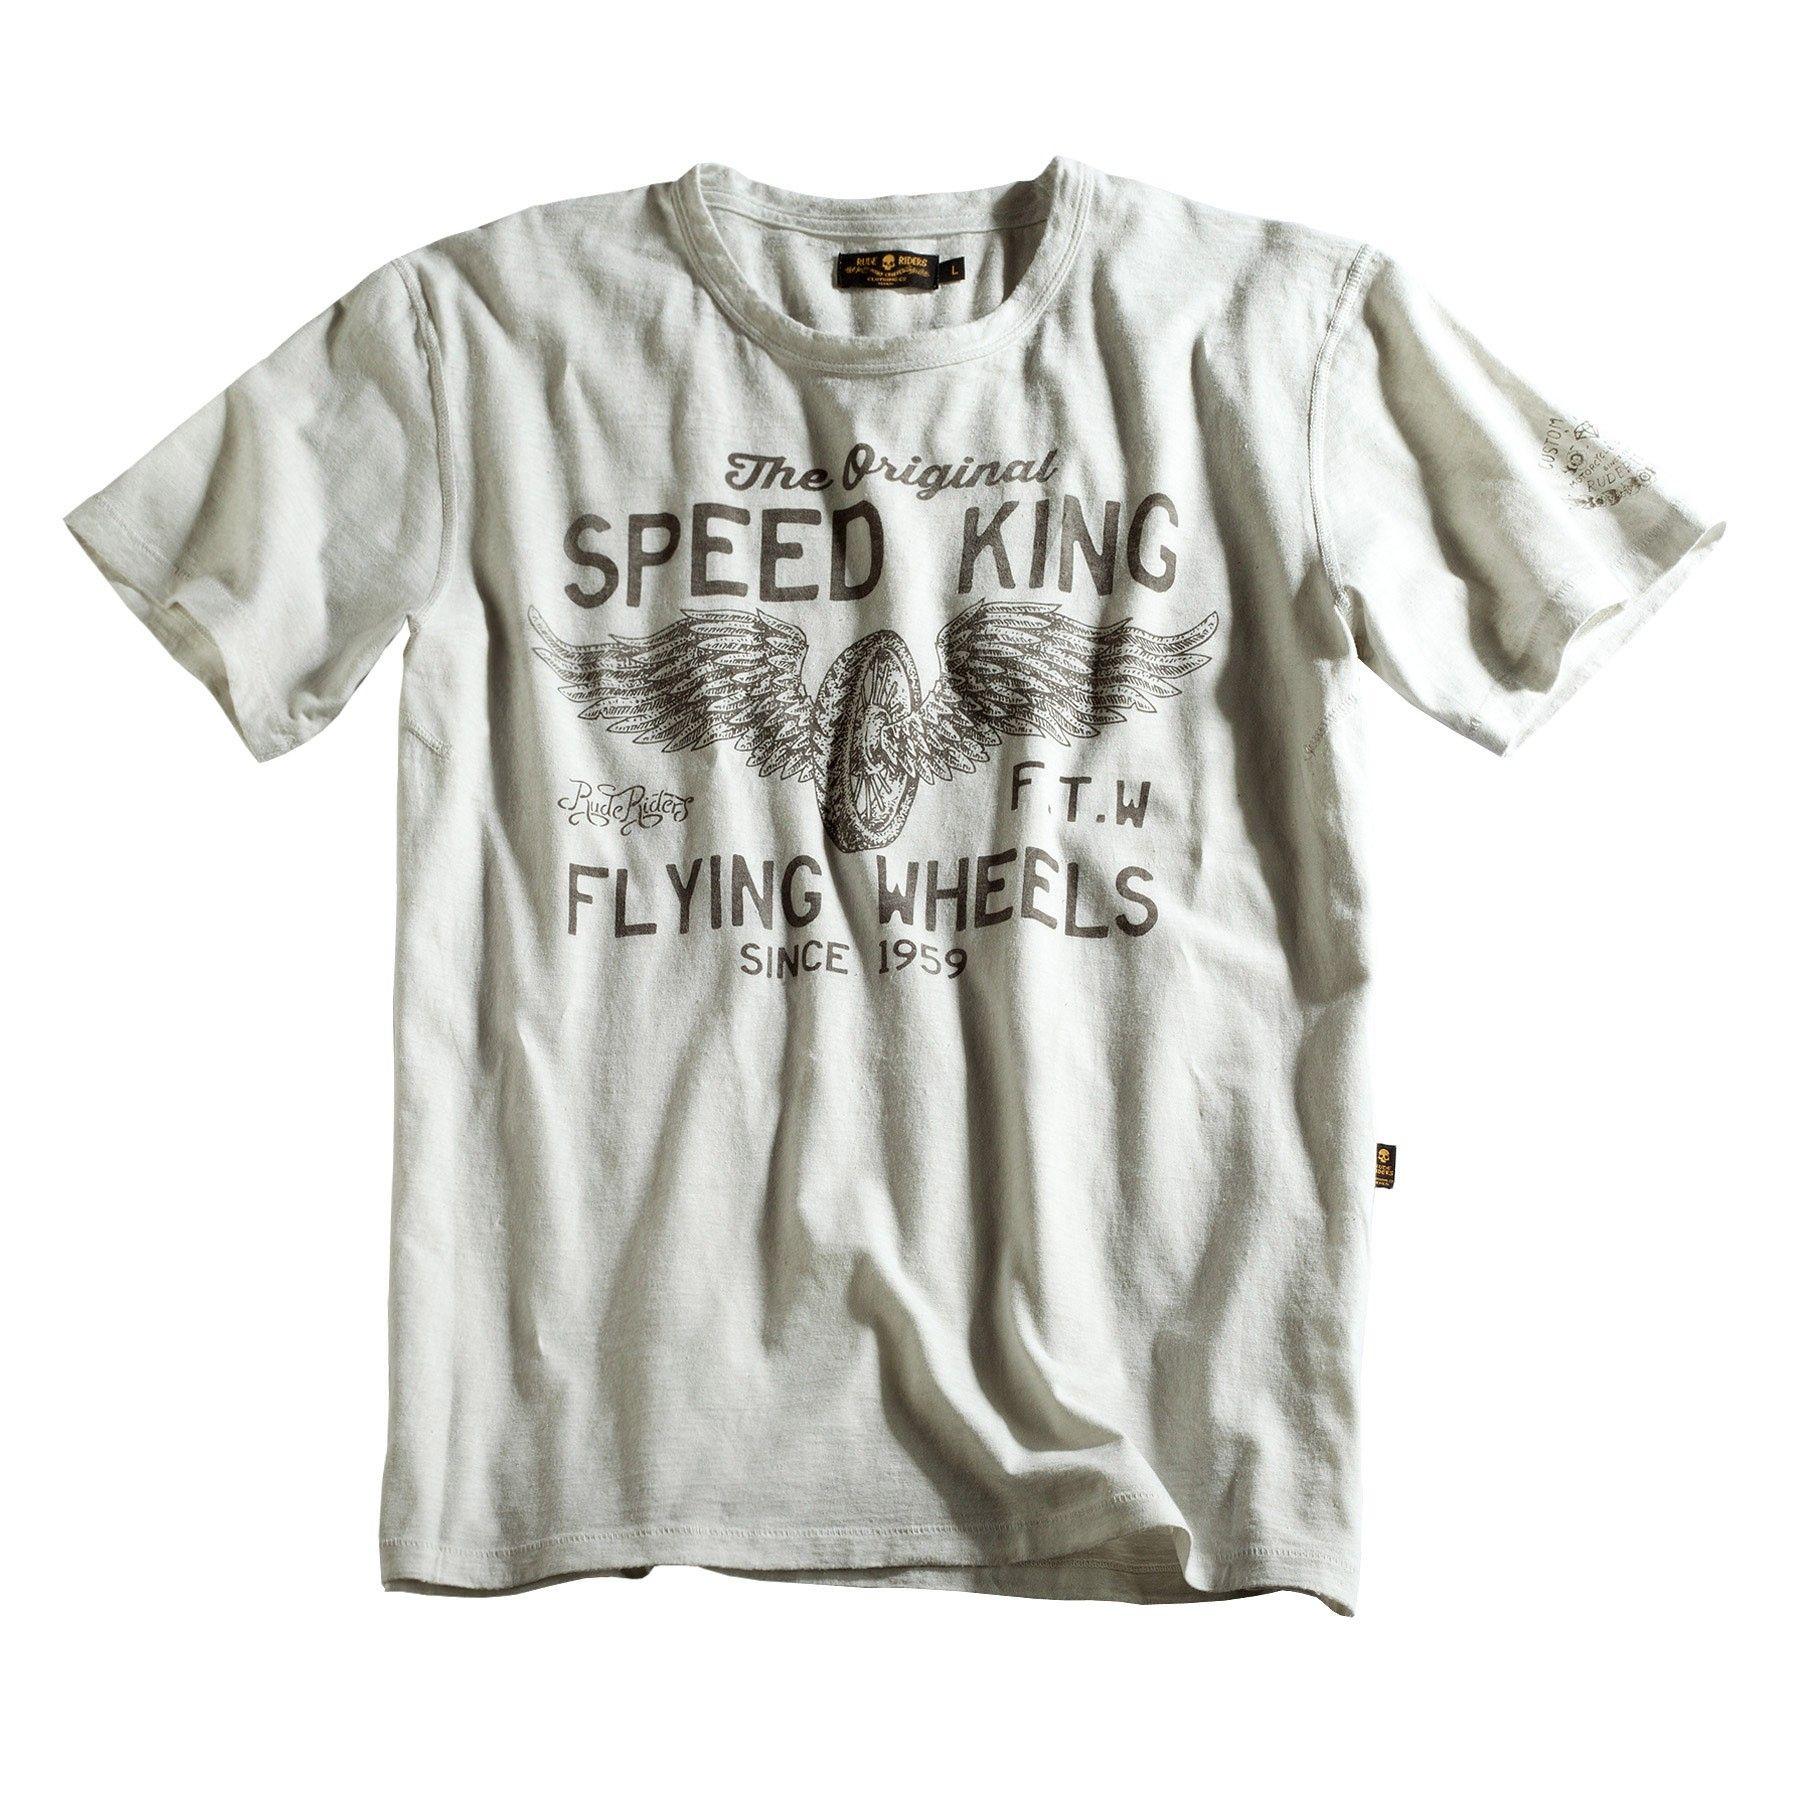 Rude Riders T-Shirt Speed King